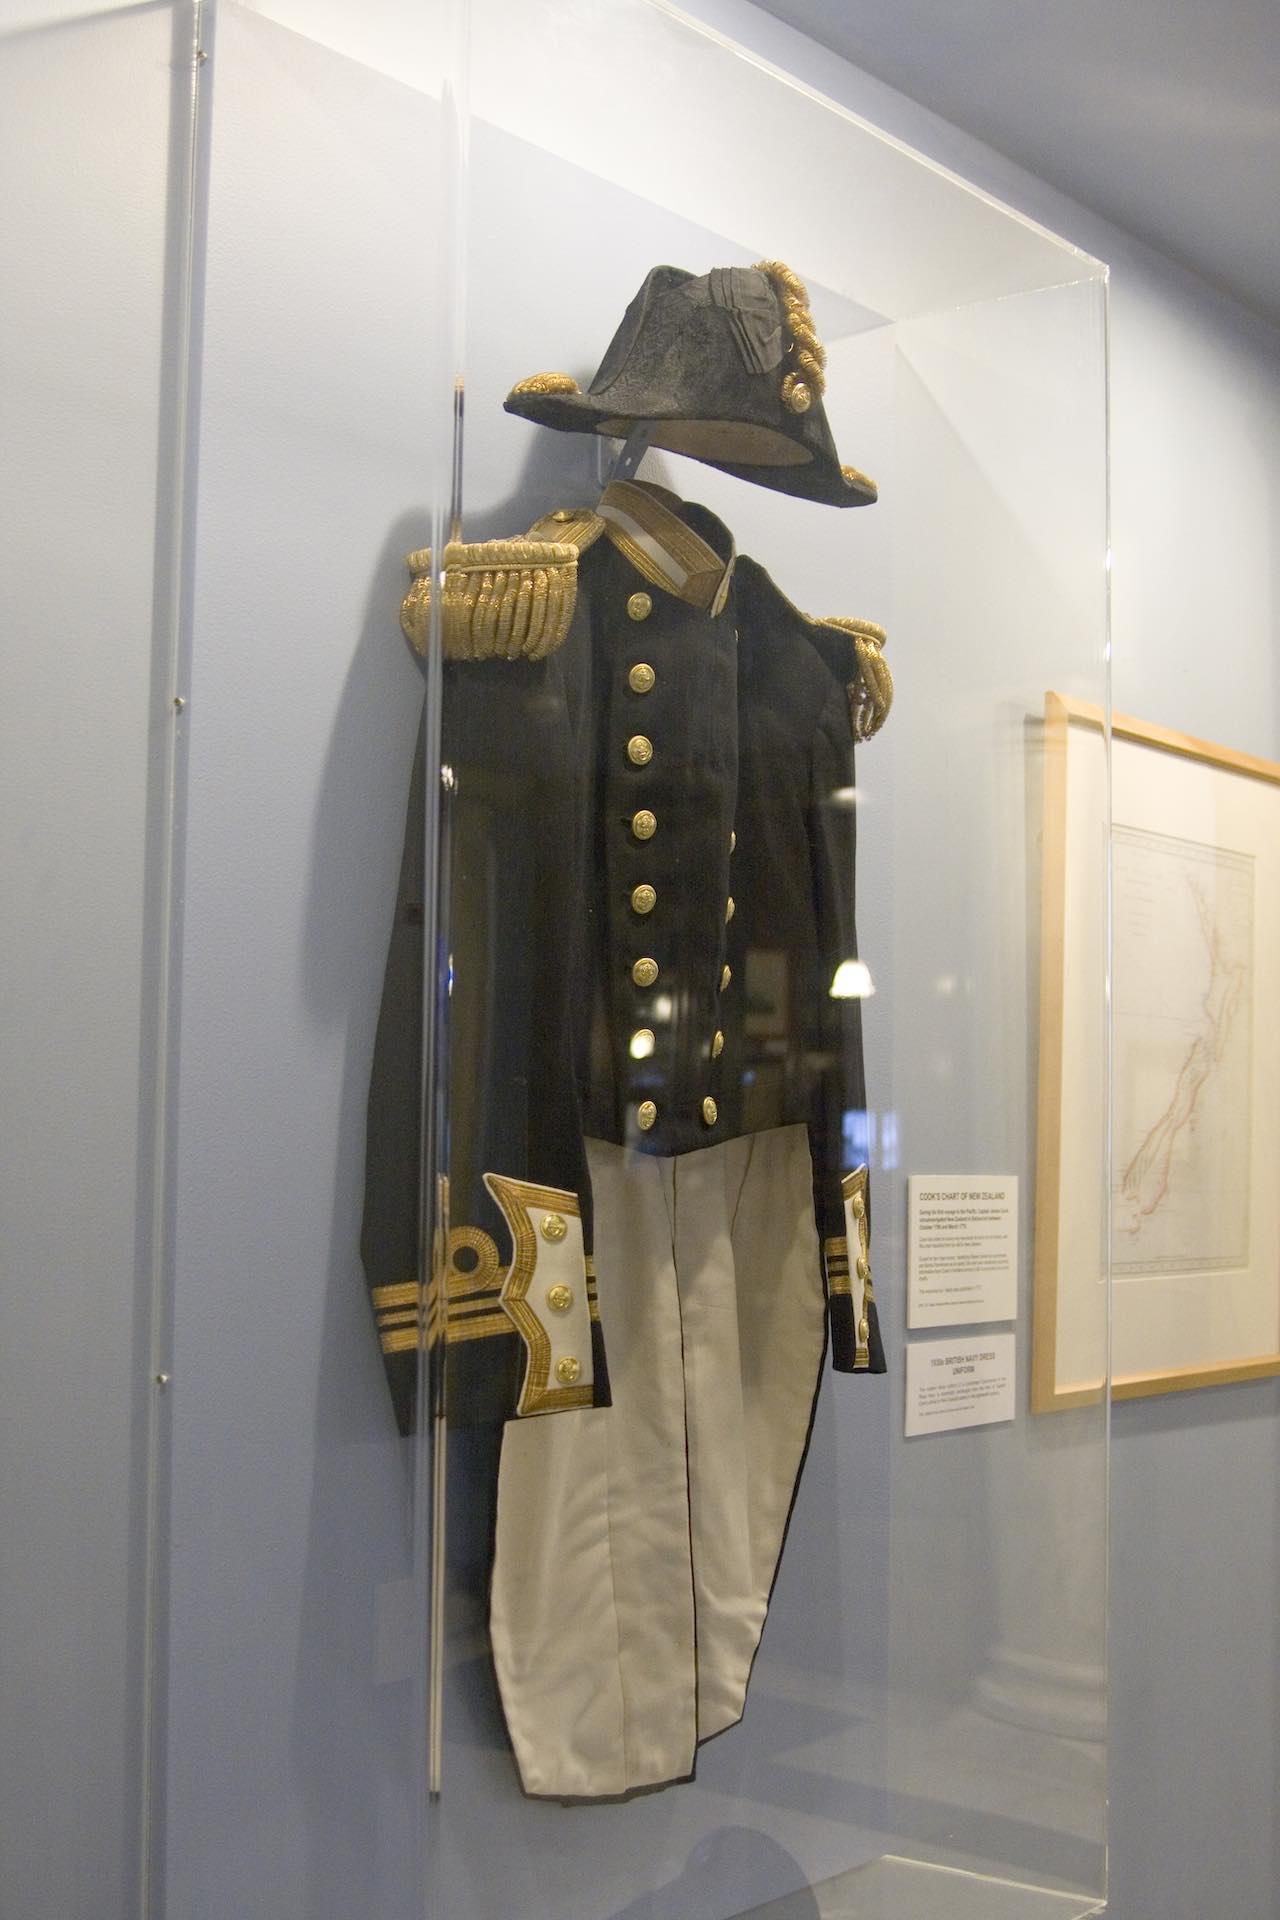 New Zealand Maritime Museum Auckland